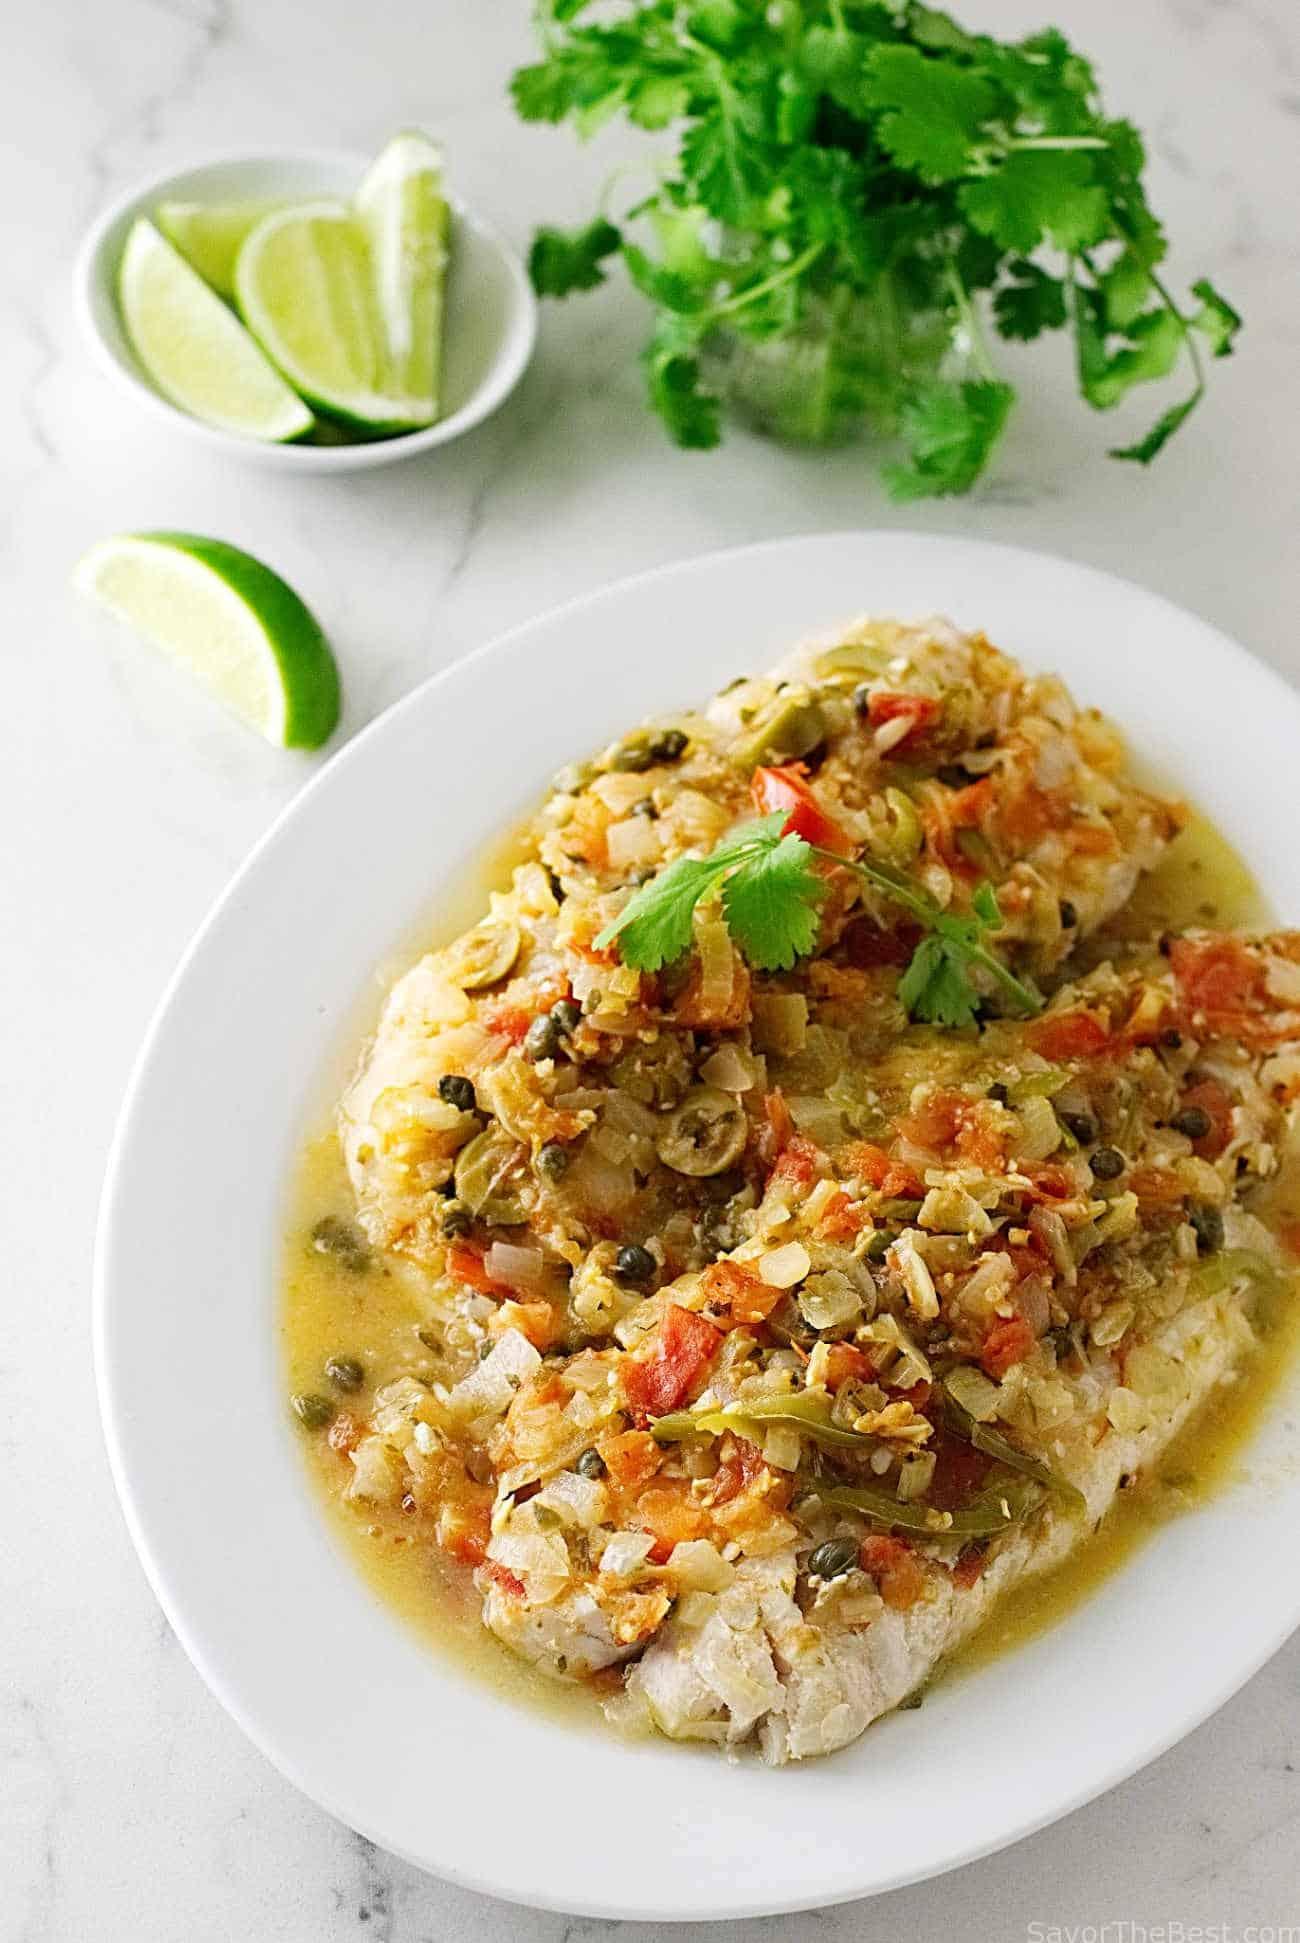 Red snapper veracruz savor the best for Fish veracruz recipe